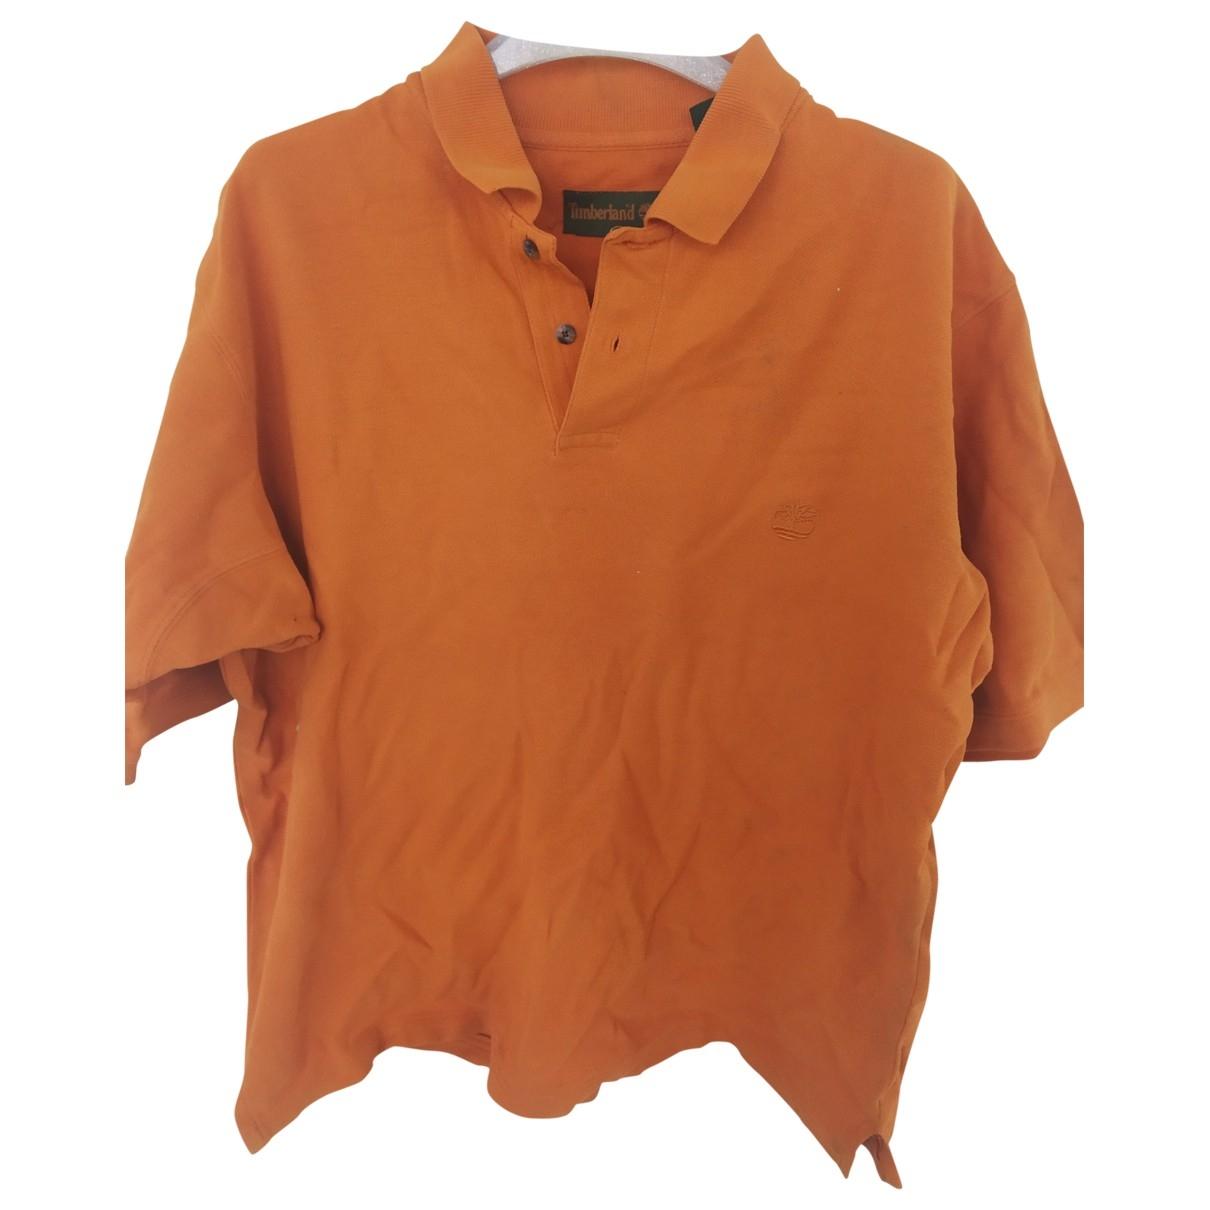 Timberland - Polos   pour homme en coton - orange